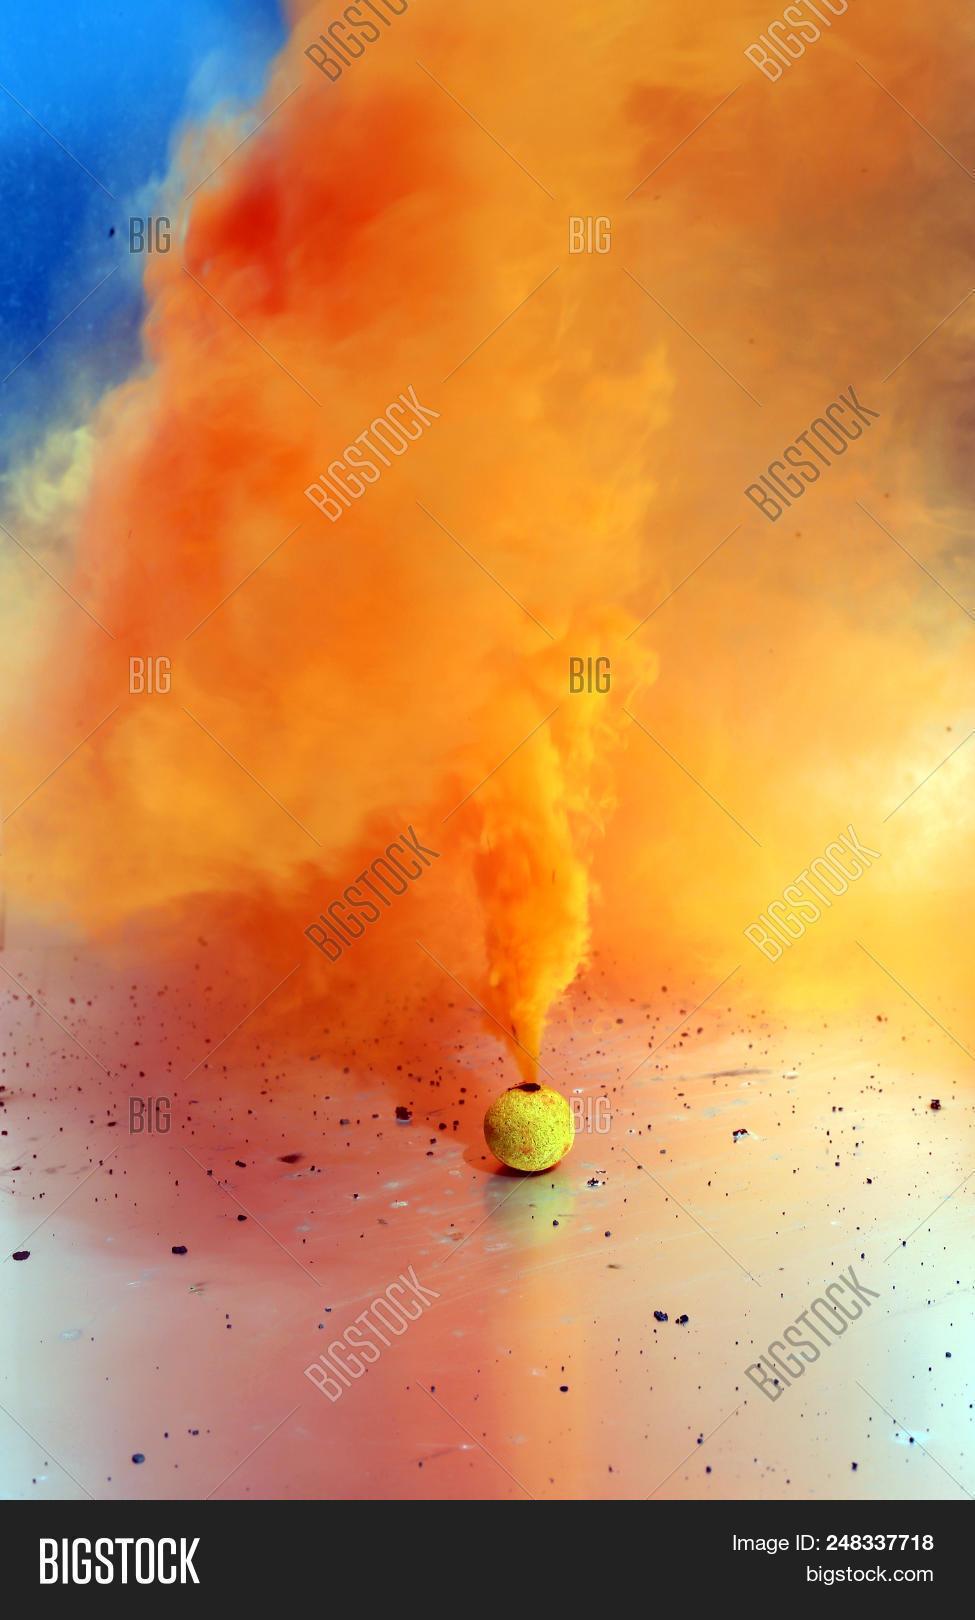 Smoke Bomb  4th July Image & Photo (Free Trial) | Bigstock